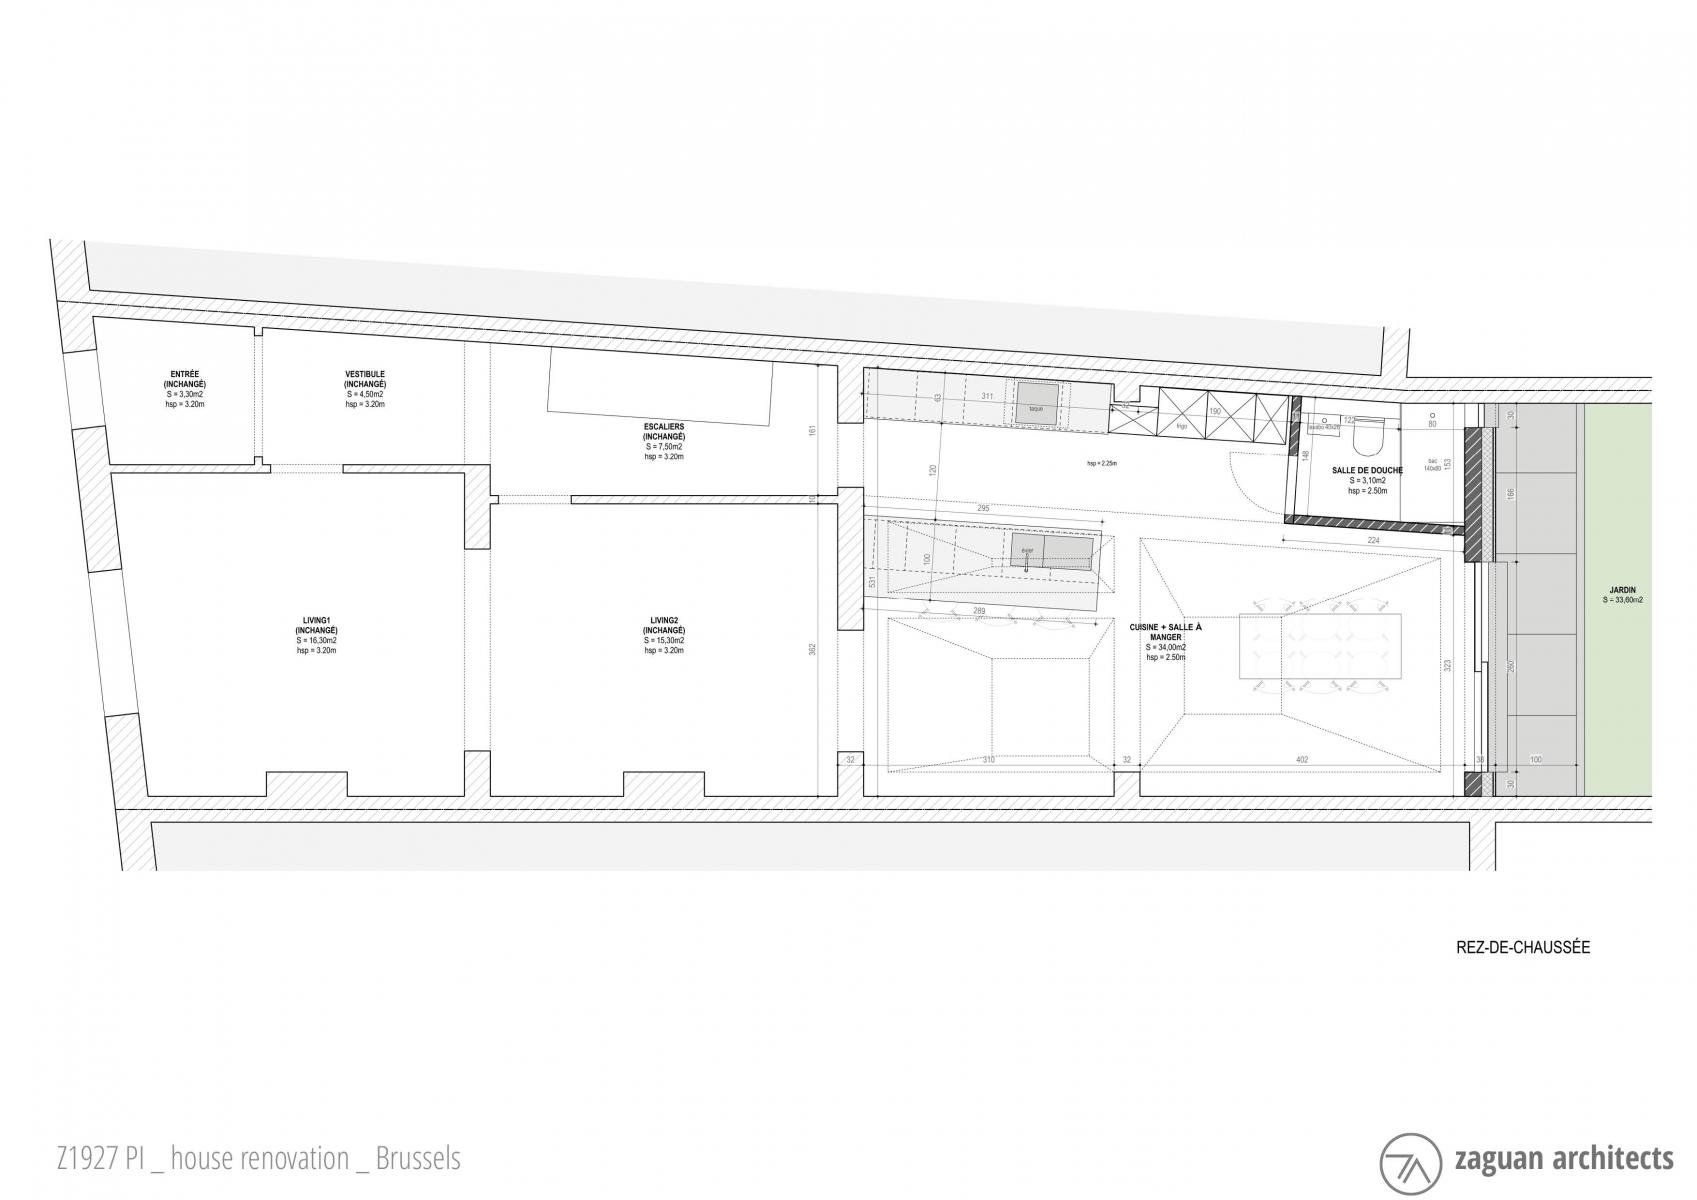 andres gonzalez architecte house renovation brussels Z1927 03